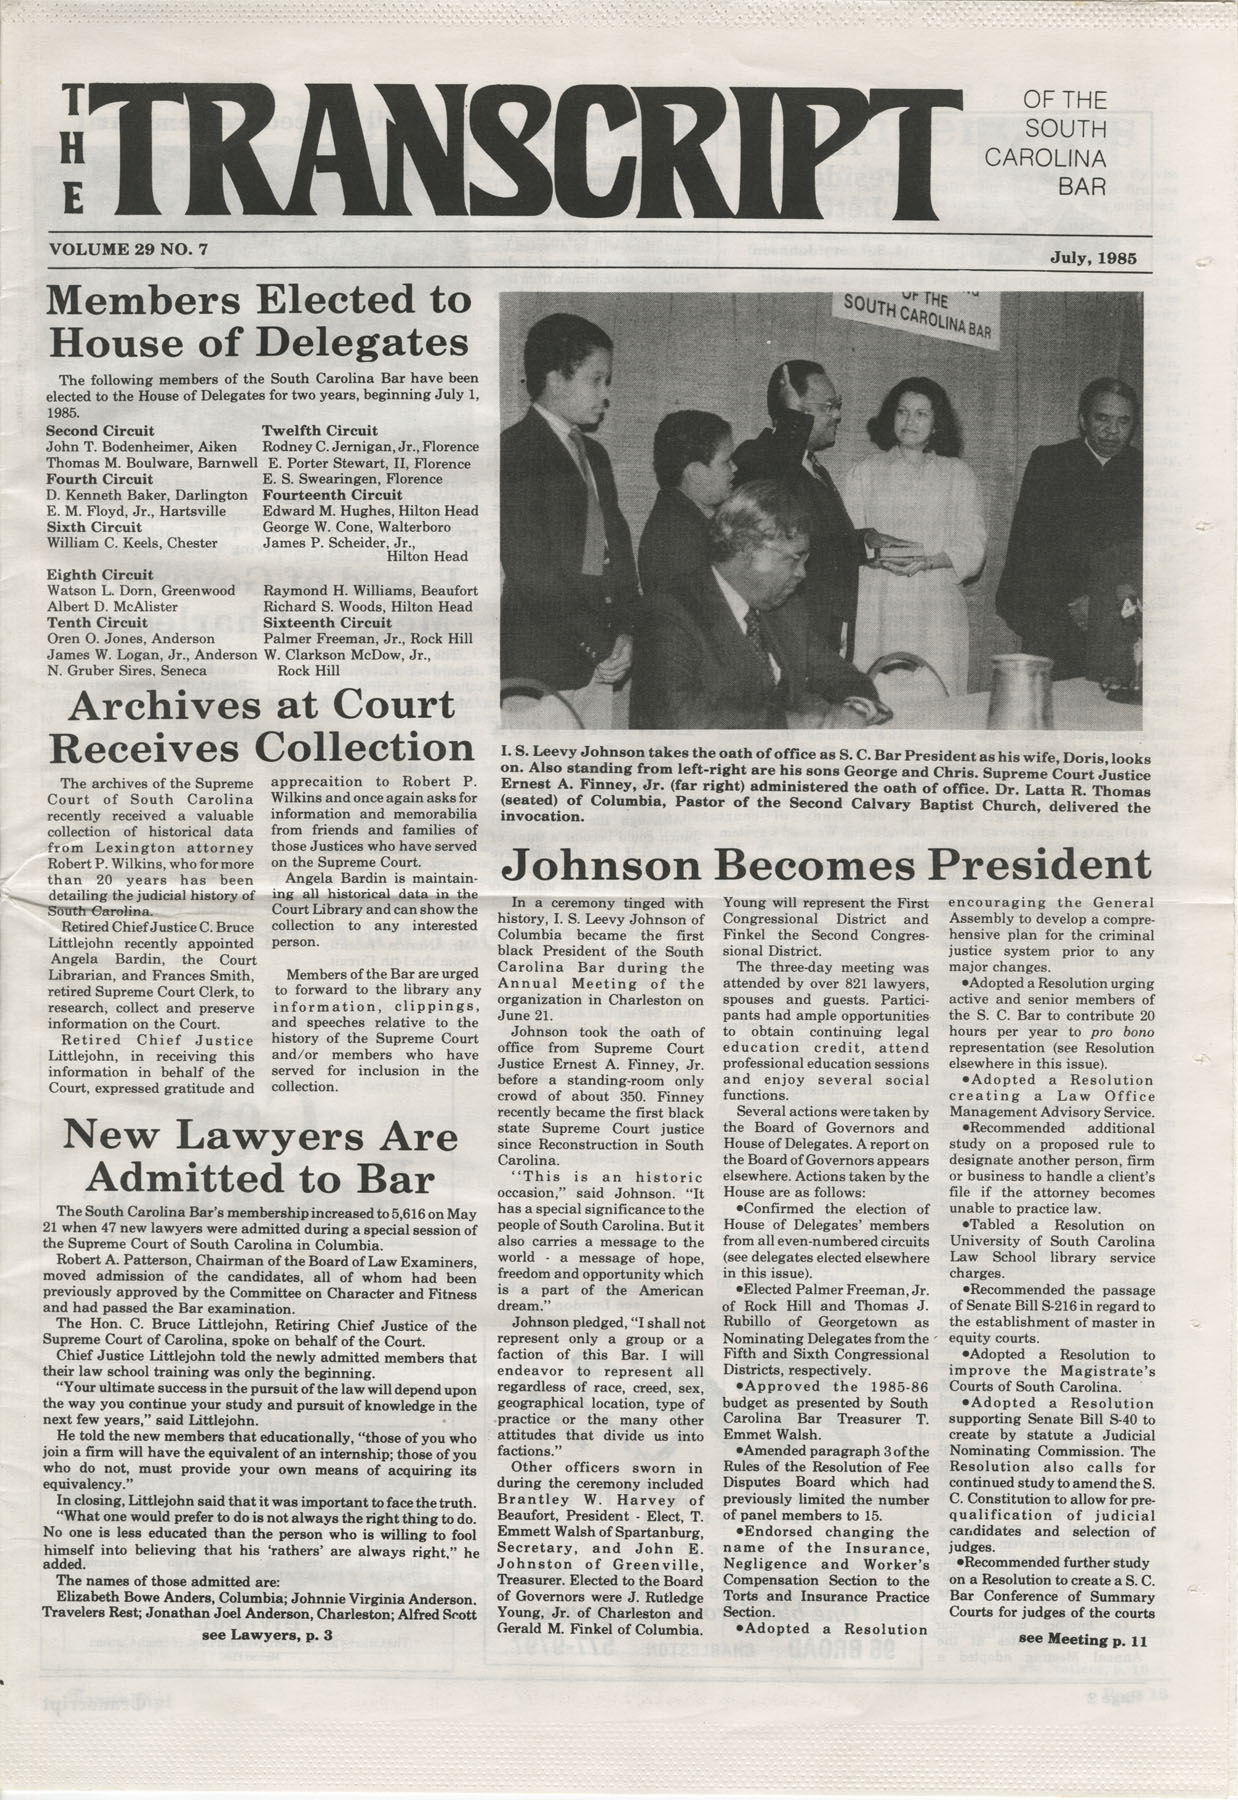 The Transcript of the South Carolina Bar, Vol. 29 No. 7, July 1985, Page 1